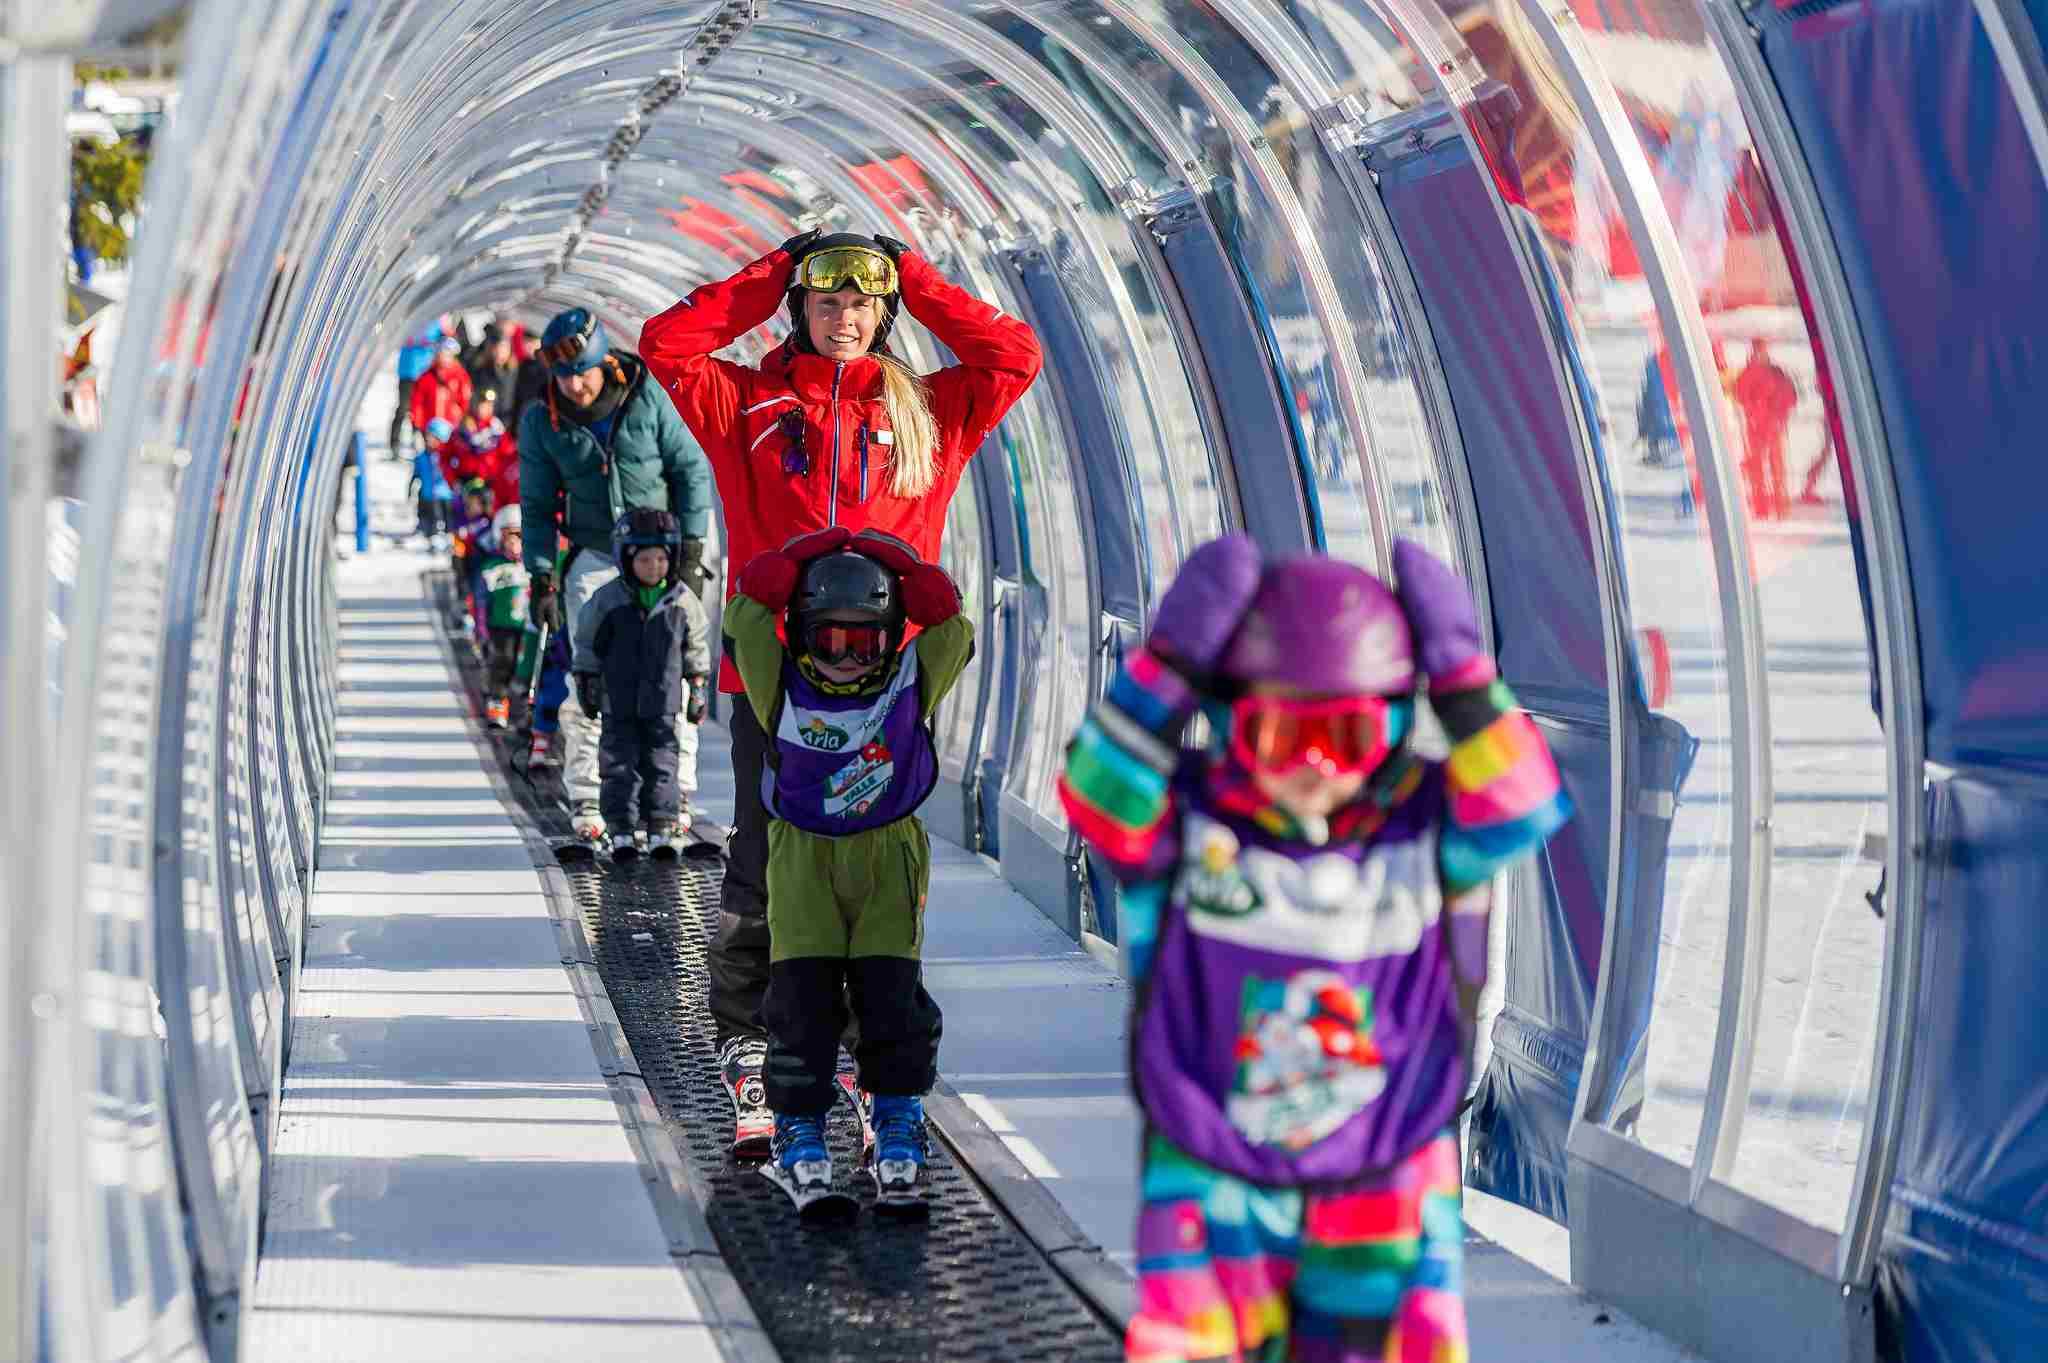 Vemdalen ski resort